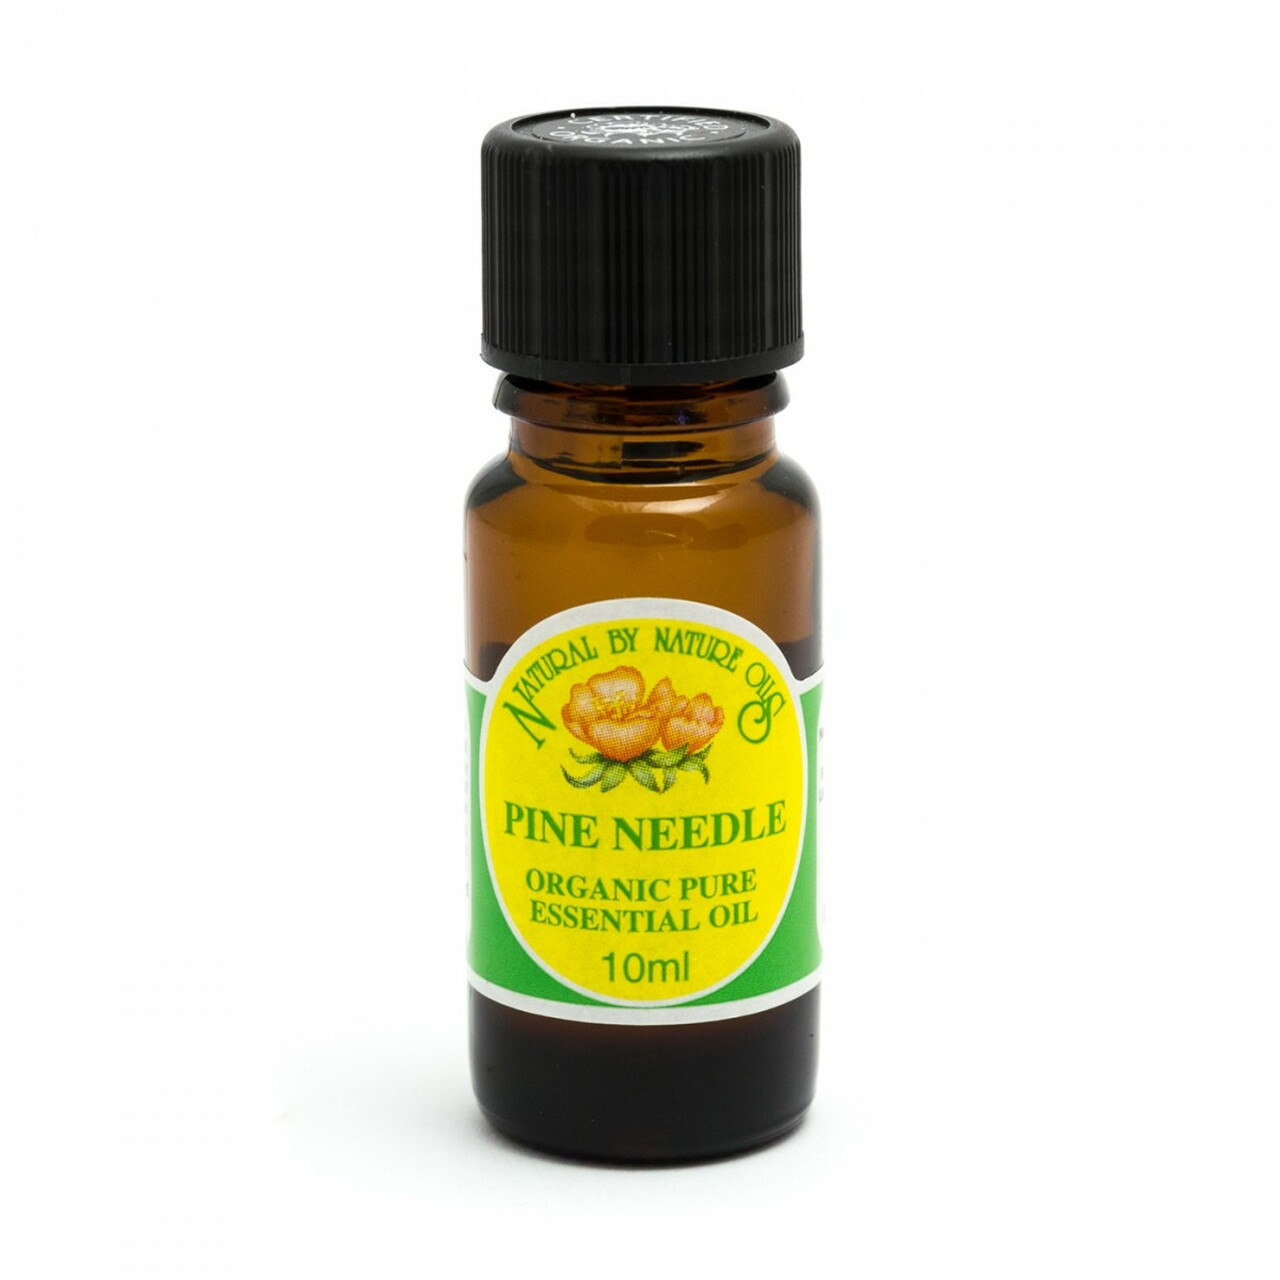 Pine Needle Organic Pure Essential Oil (France) 10ml